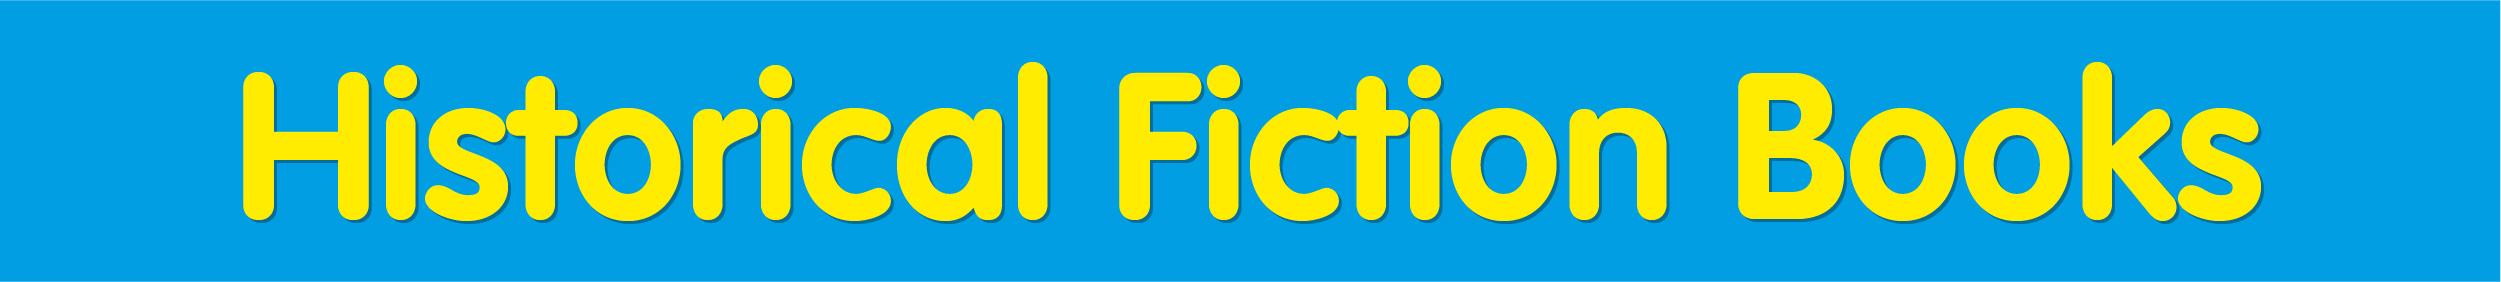 Historical Fiction Books